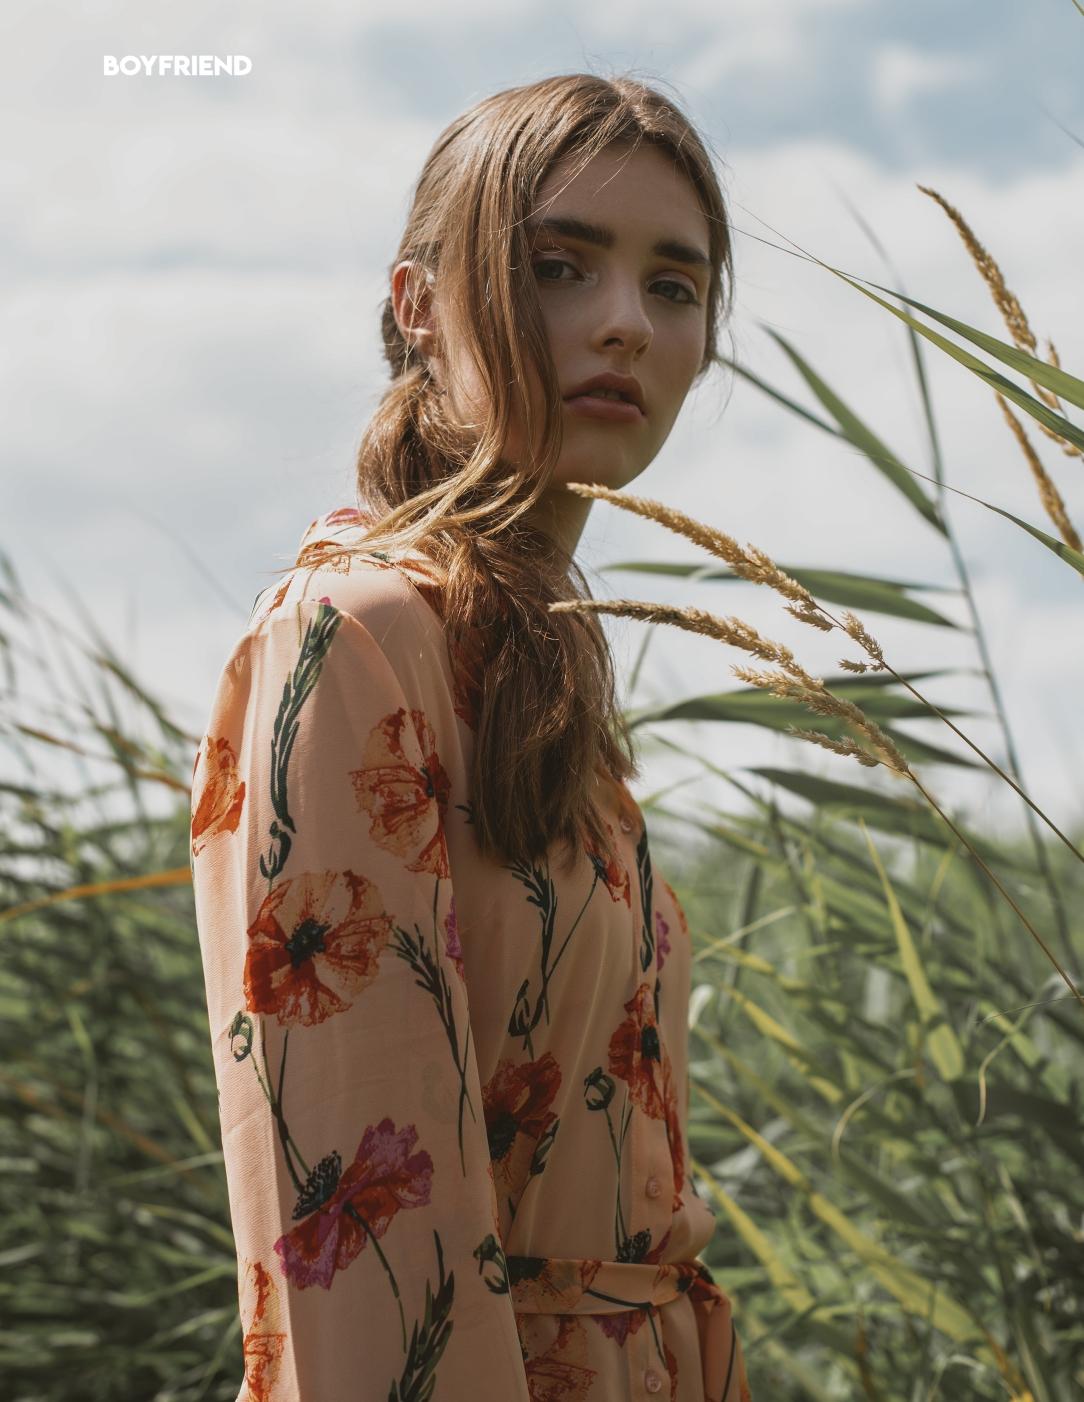 Boyfriend Mag - August 2018 - Pocketful of Sunshine - Maxime De Bruin2